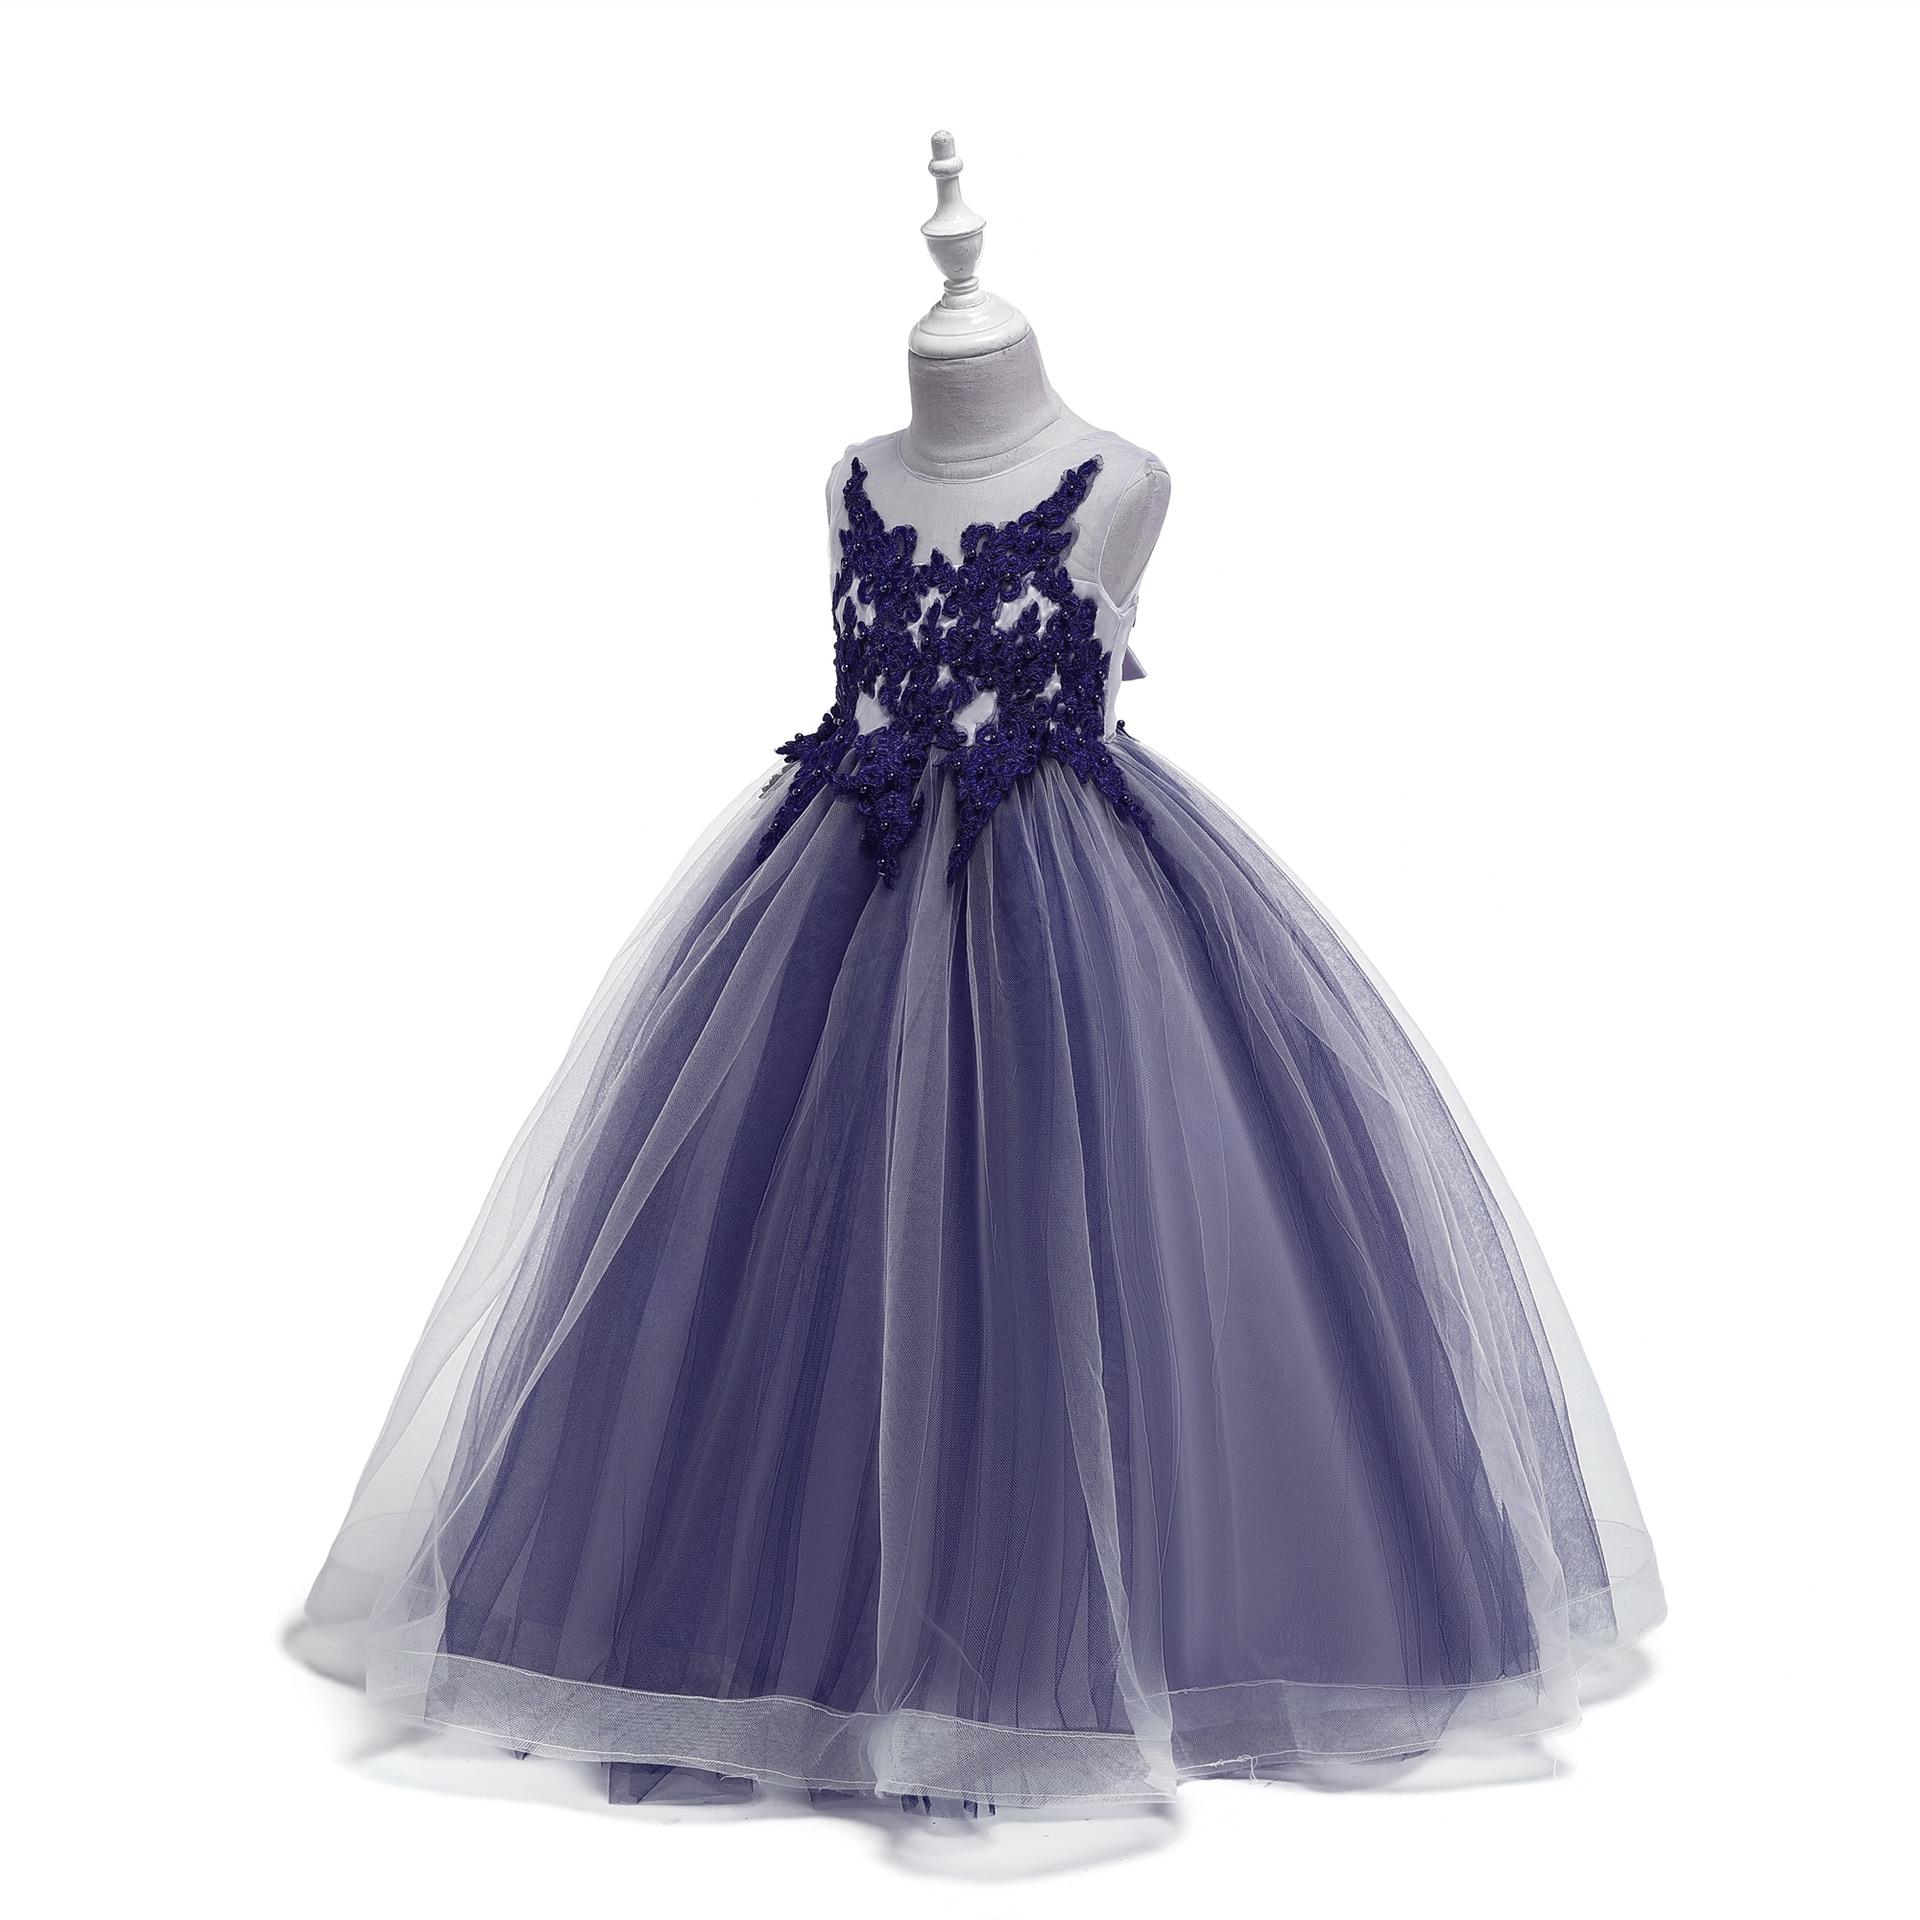 Hot Sales New Style Big Boy Wedding Dress Rose Princess Dress Girls Dress Performance Childrenswear